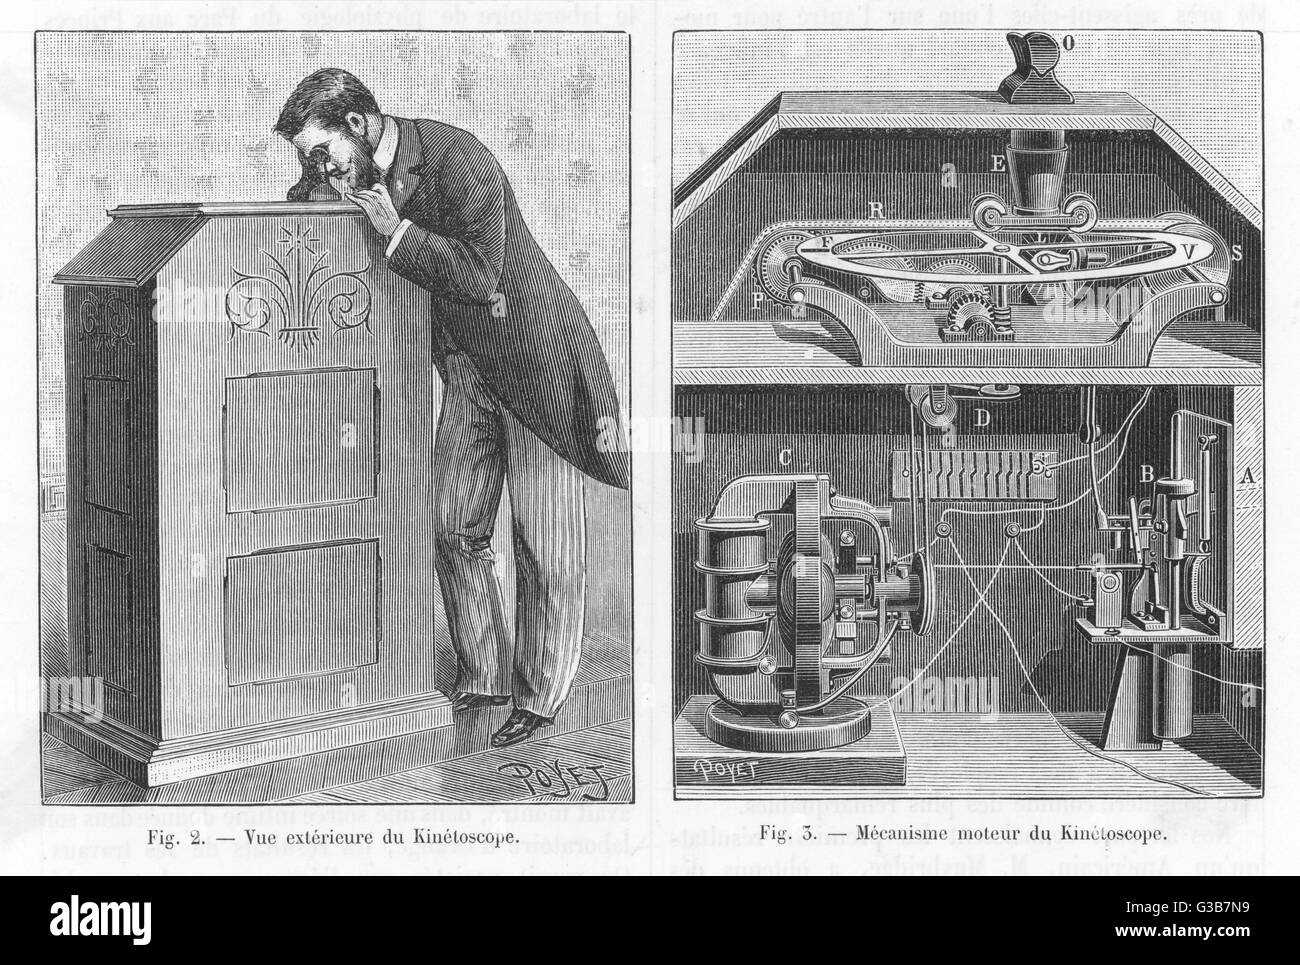 Kinetoscope Black and White Stock Photos & Images - Alamy